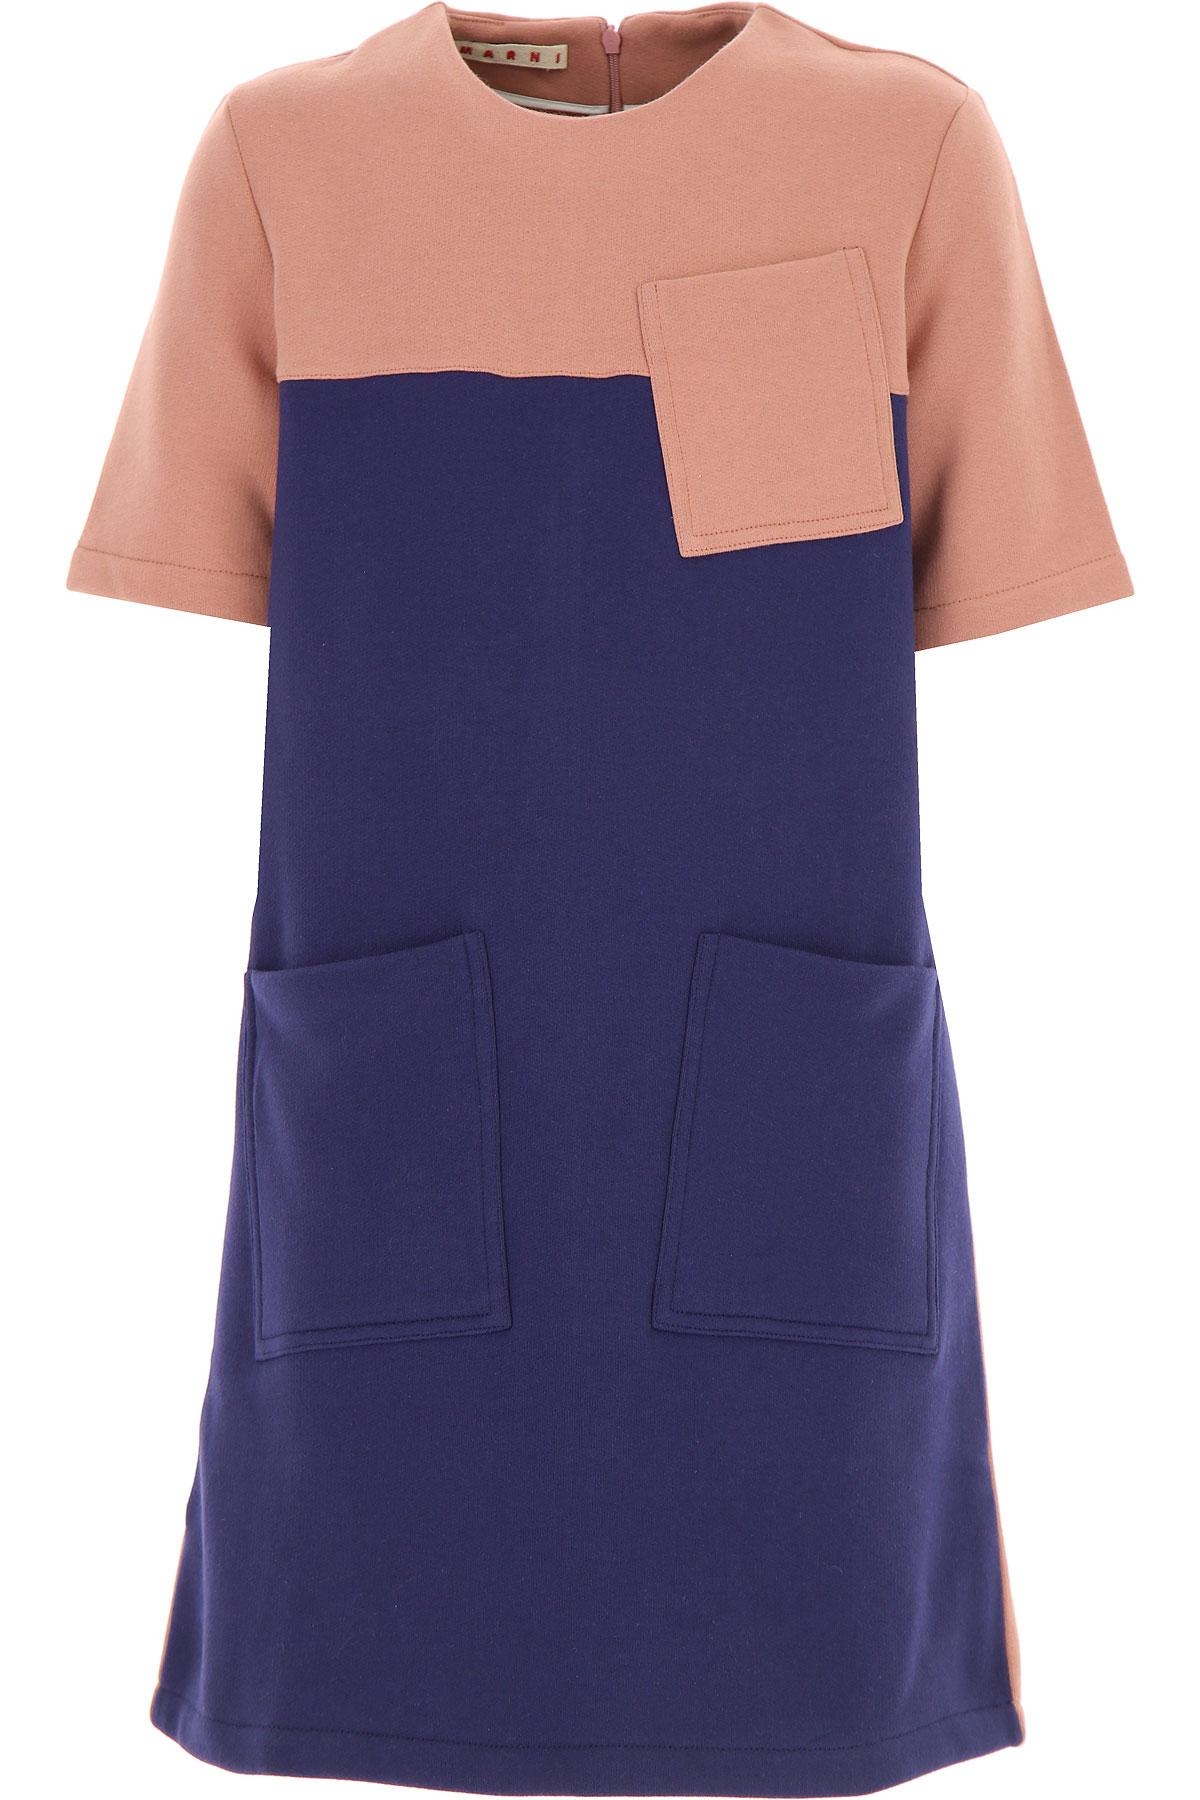 Image of Marni Girls Dress, Pink, Cotton, 2017, 10Y 14Y 8Y